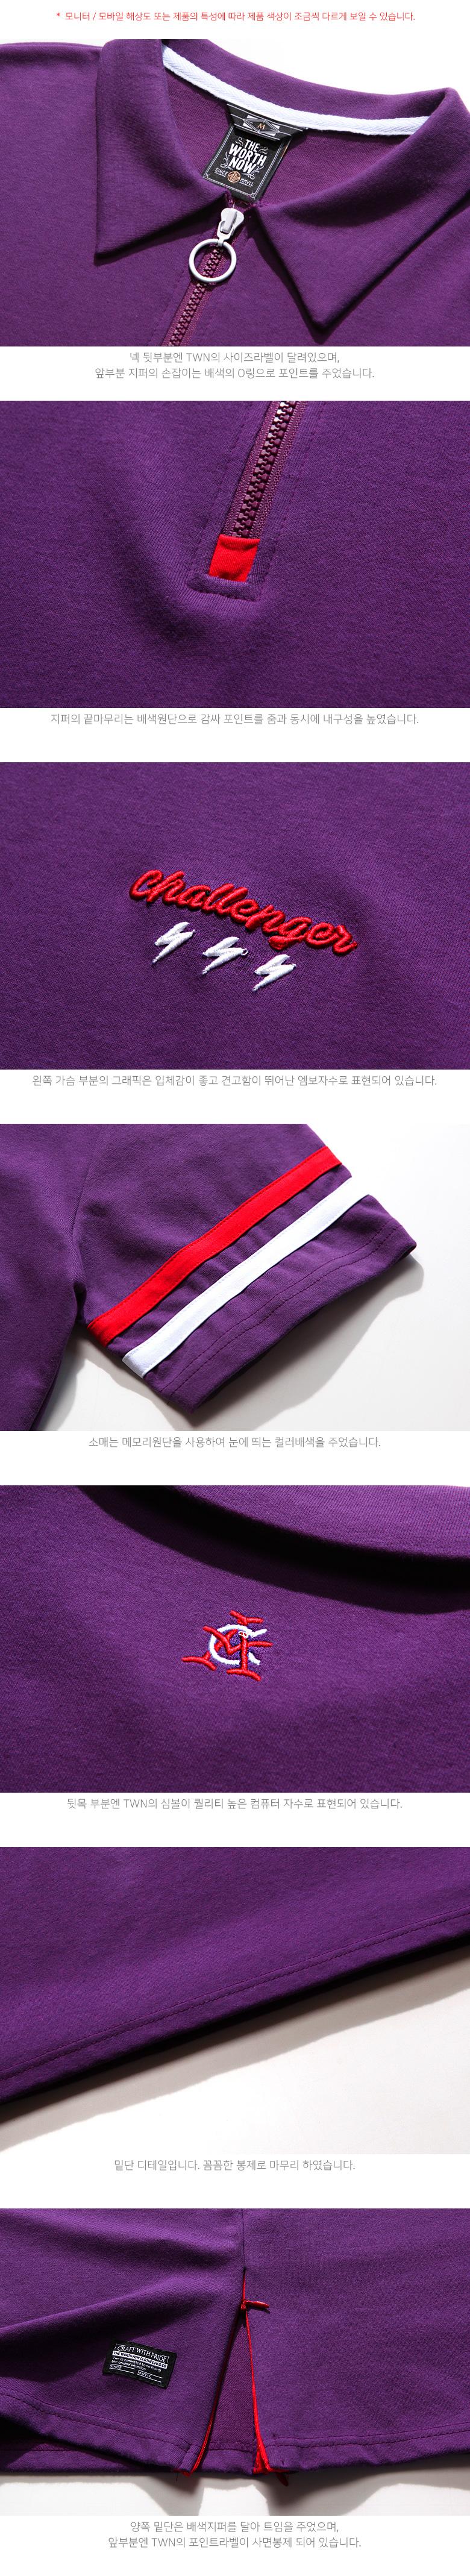 20180502_twn_challengercollar_detail_violet_ym_02.jpg